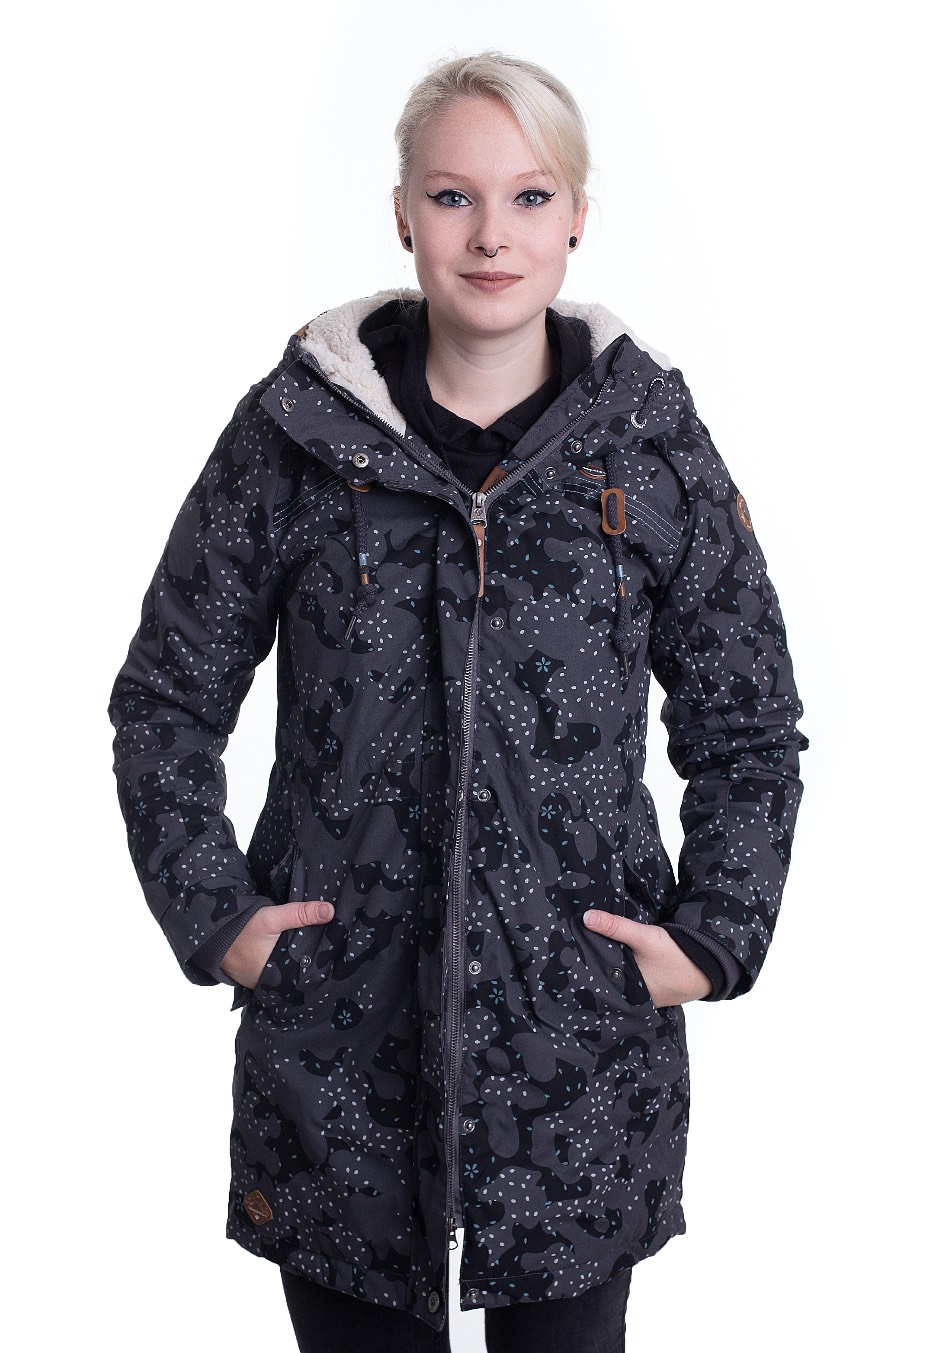 Jacken - Ragwear Tawny Camo Dark Grey Jacken  - Onlineshop IMPERICON